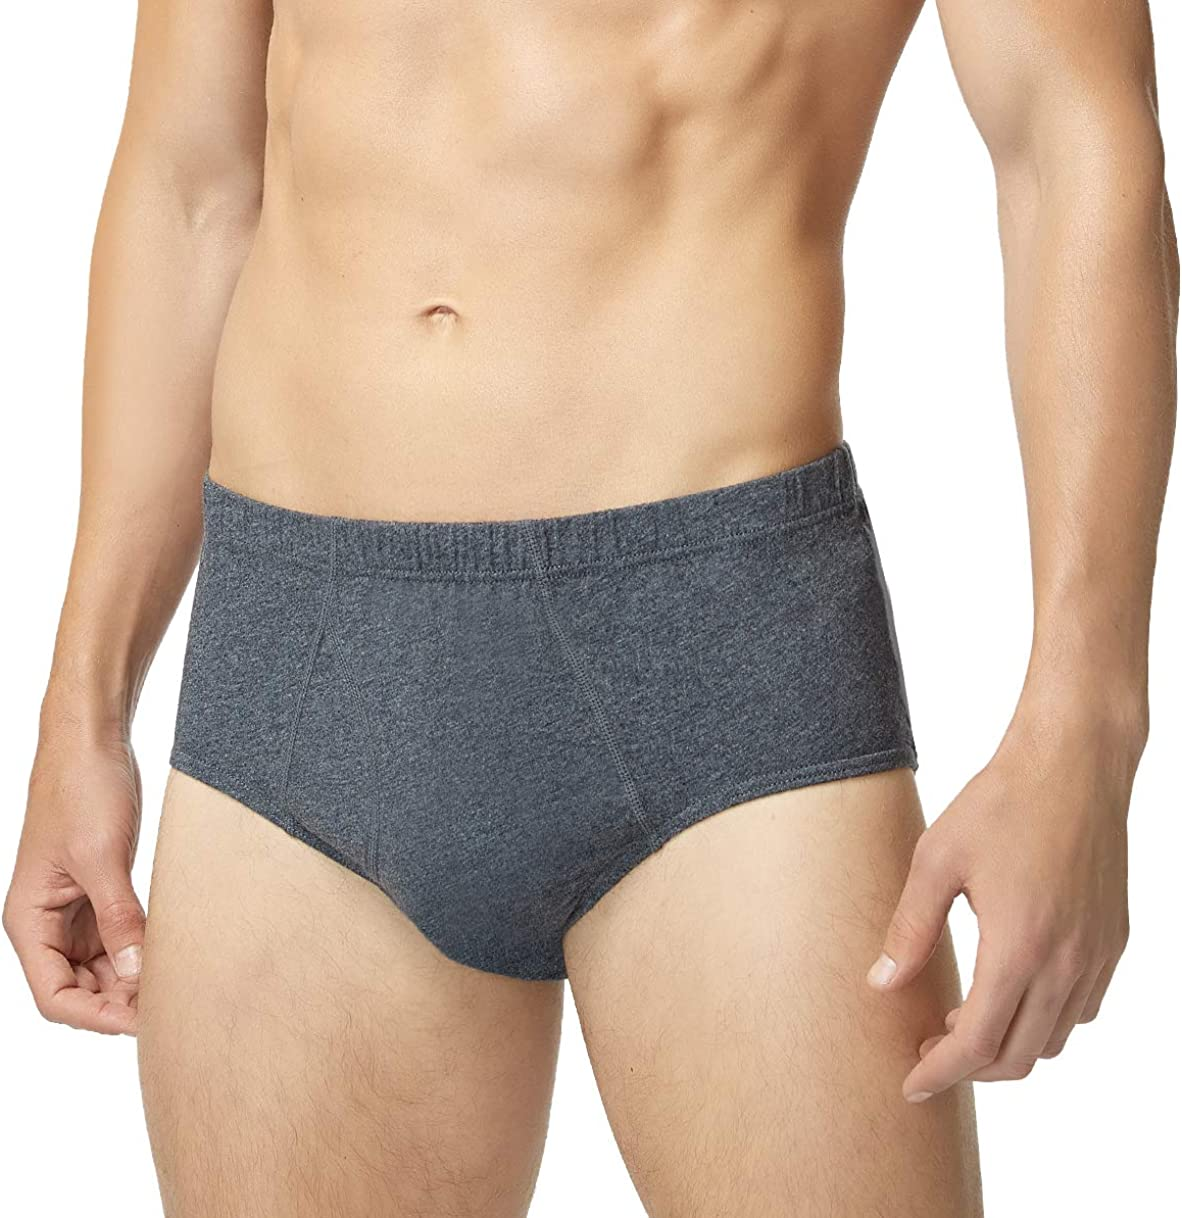 Banunos Men's Briefs Underwear High 55% OFF material 100% Low Cotton Rise Comfy